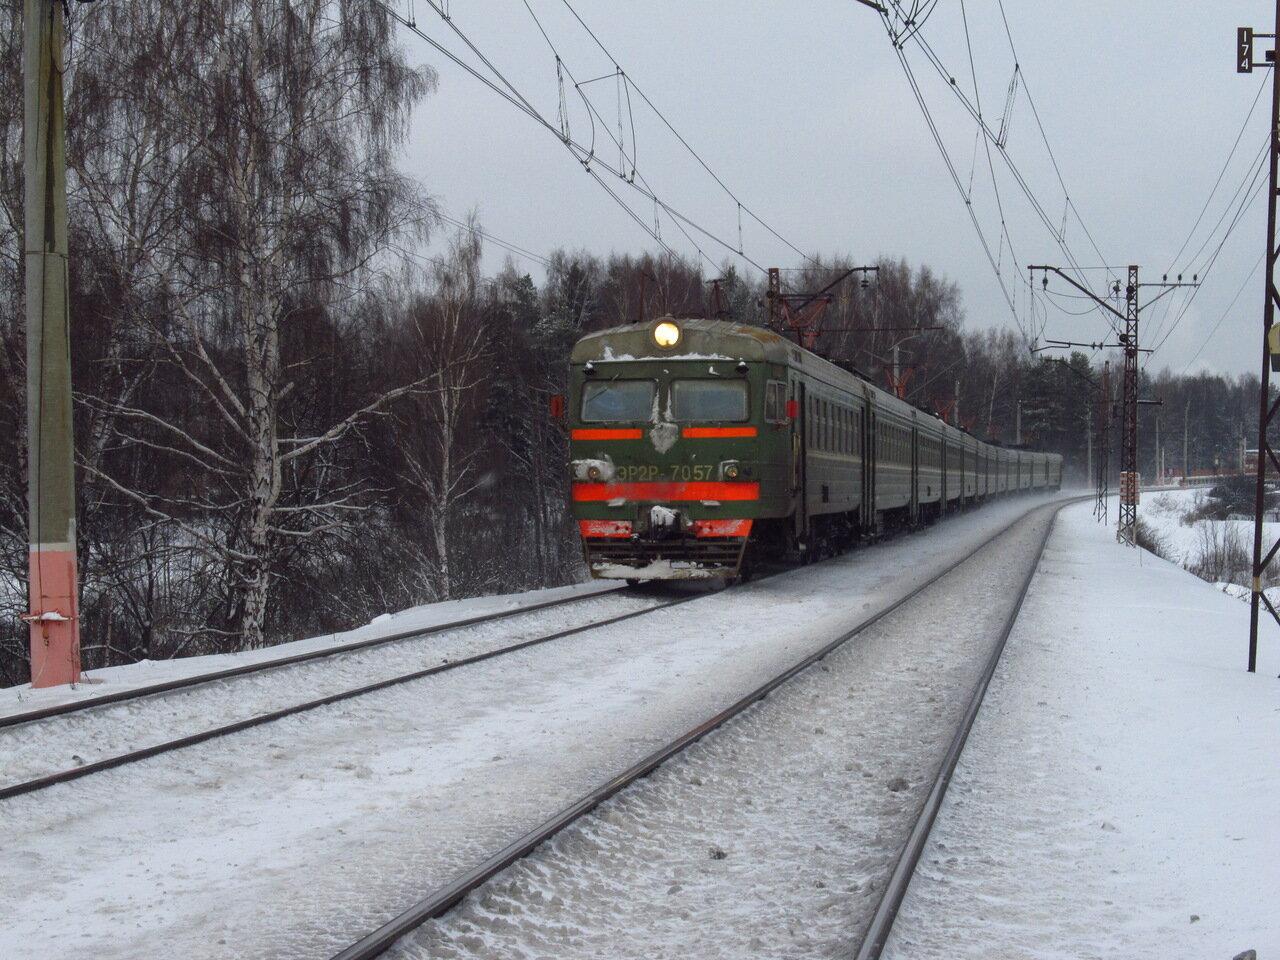 платформа Некрасовская 26.02.12 0_795d5_7f32b0a8_XXXL